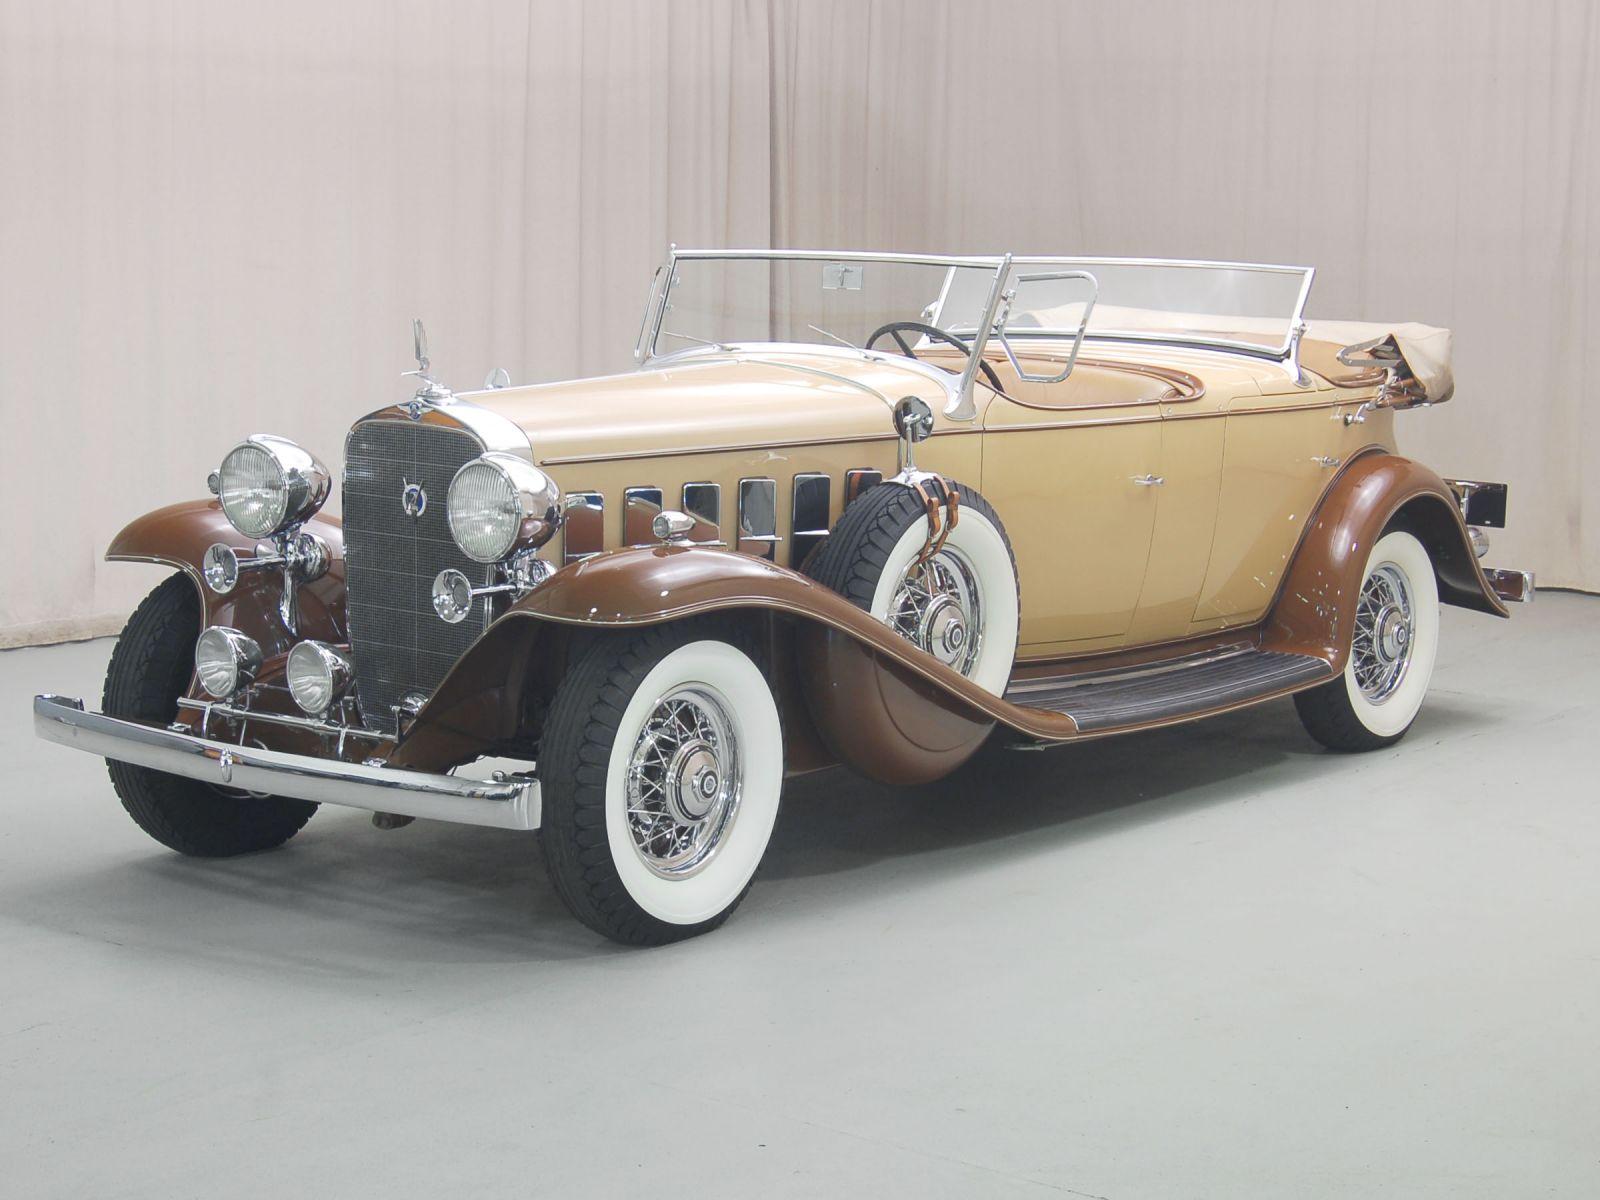 1932 cadillac v12 dual cowl sport phaeton hyman ltd. Black Bedroom Furniture Sets. Home Design Ideas